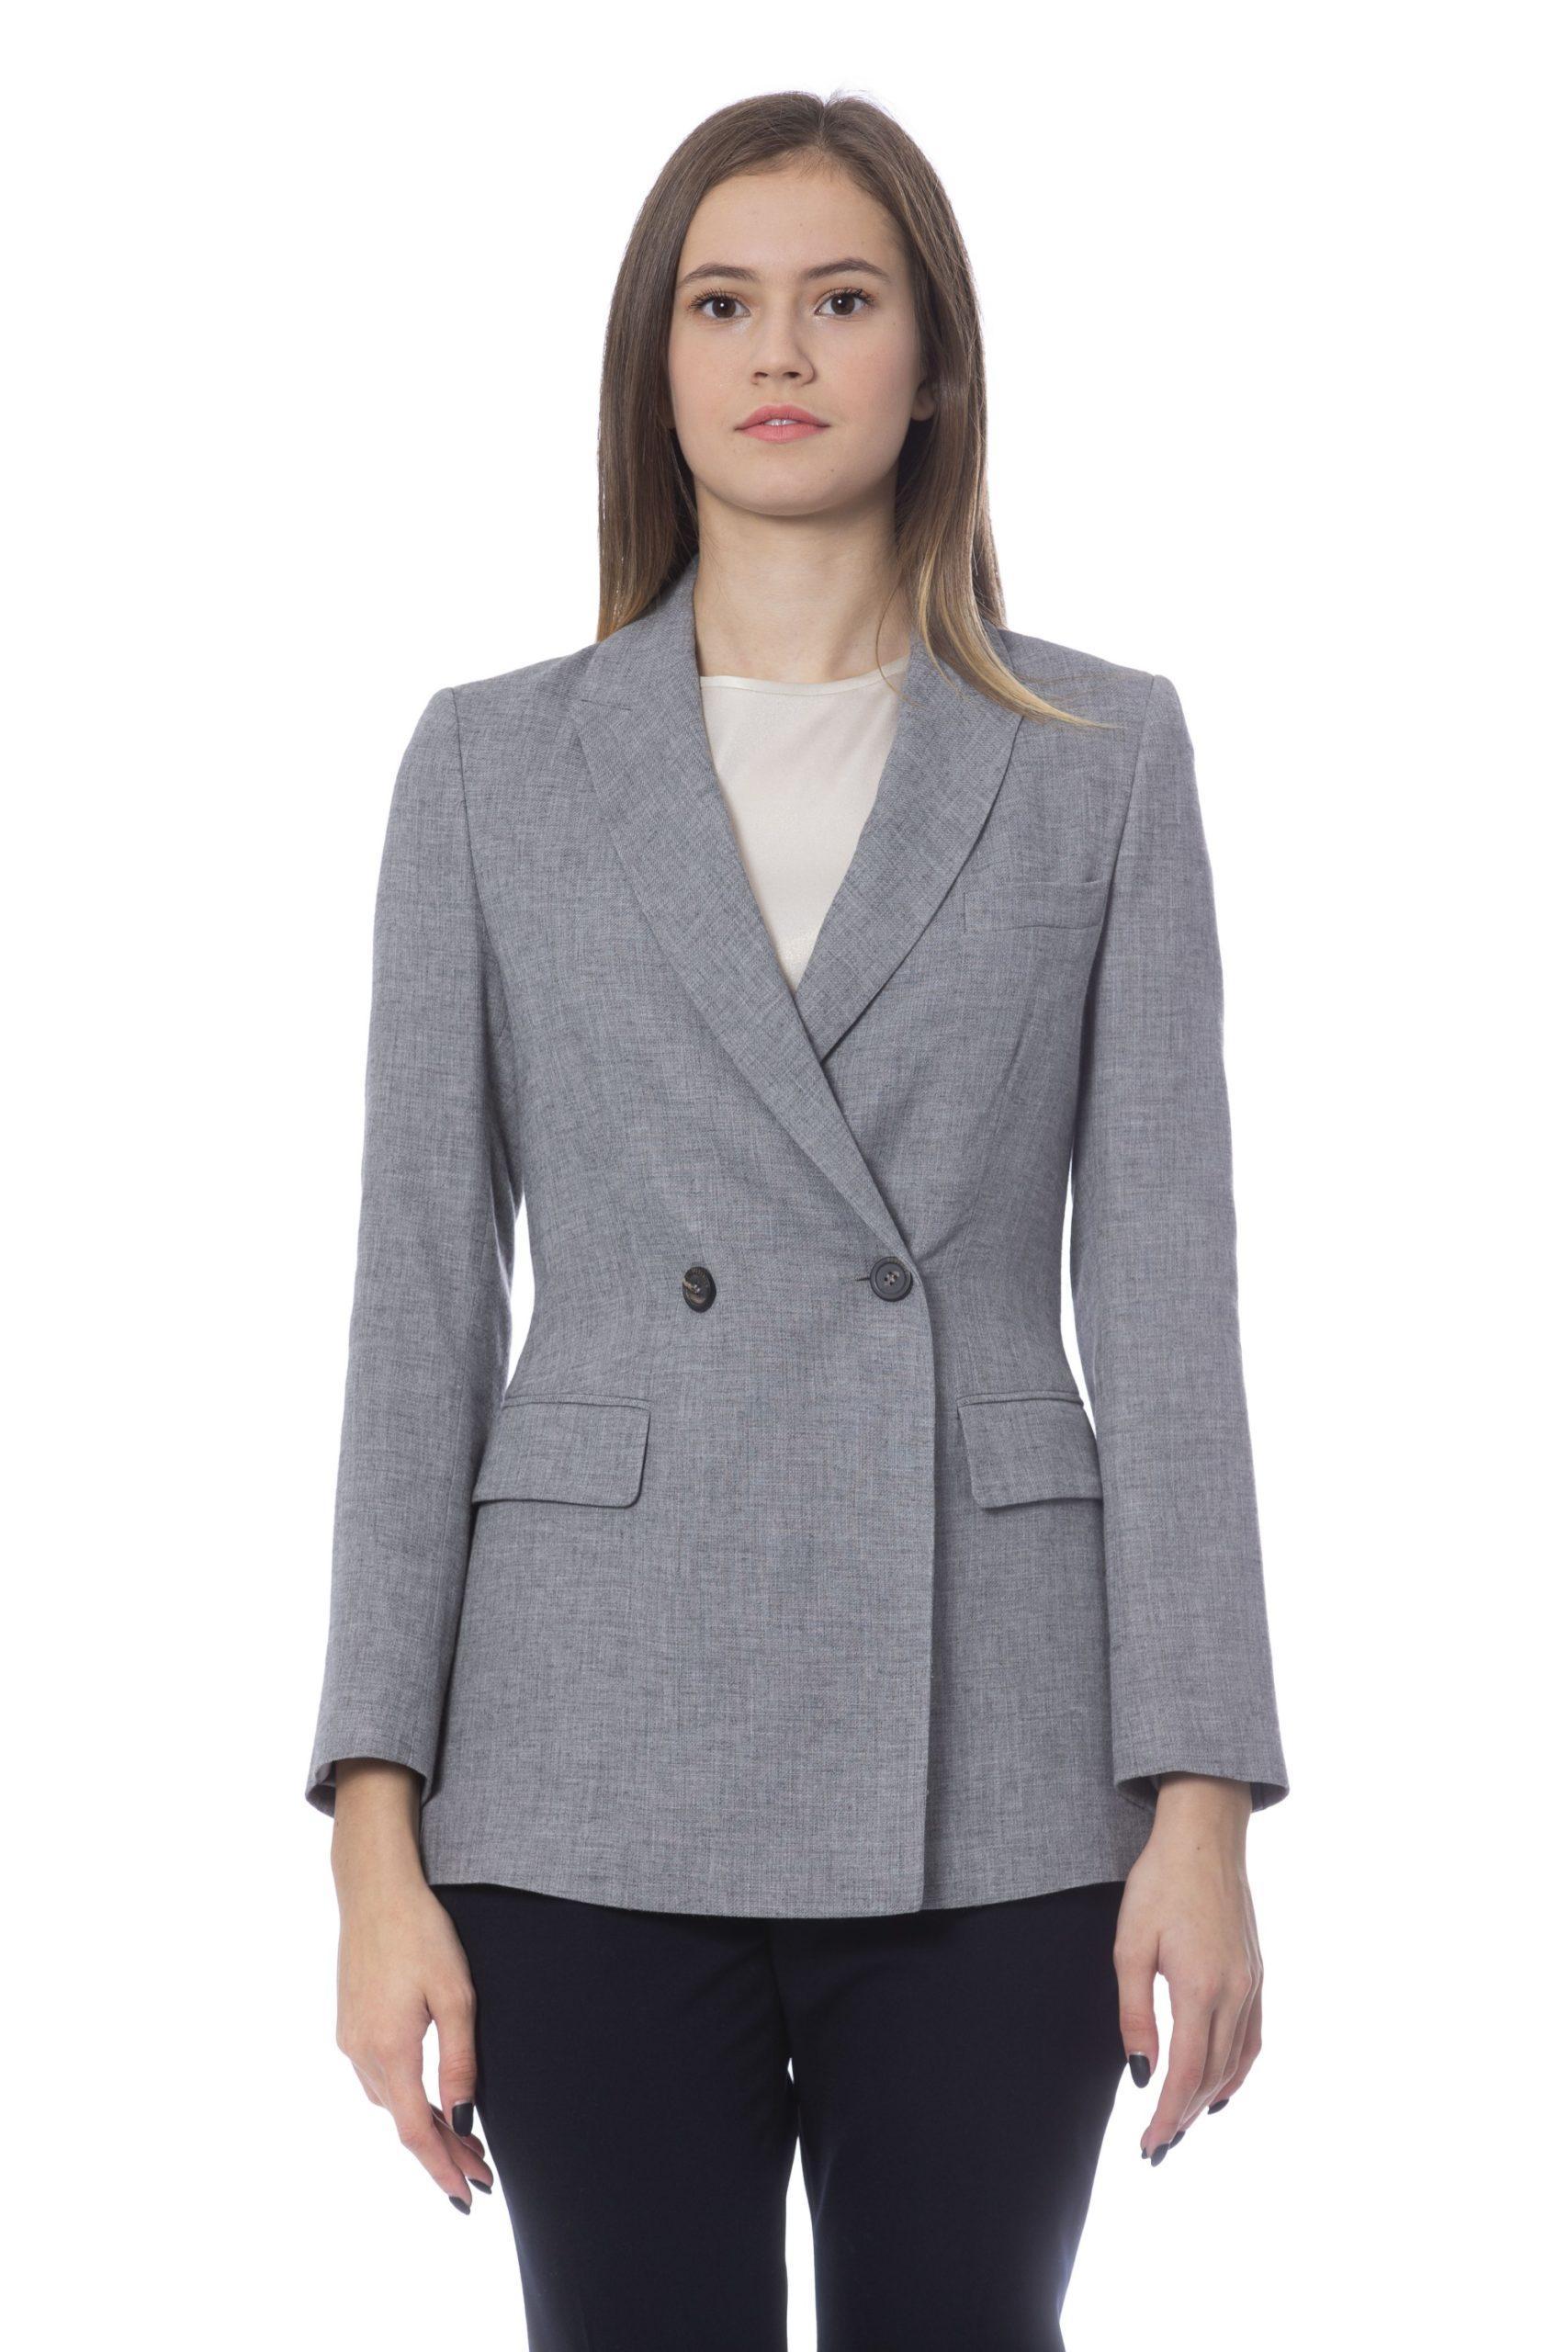 Peserico Women's Jacket Grey PE854510 - IT42 | S